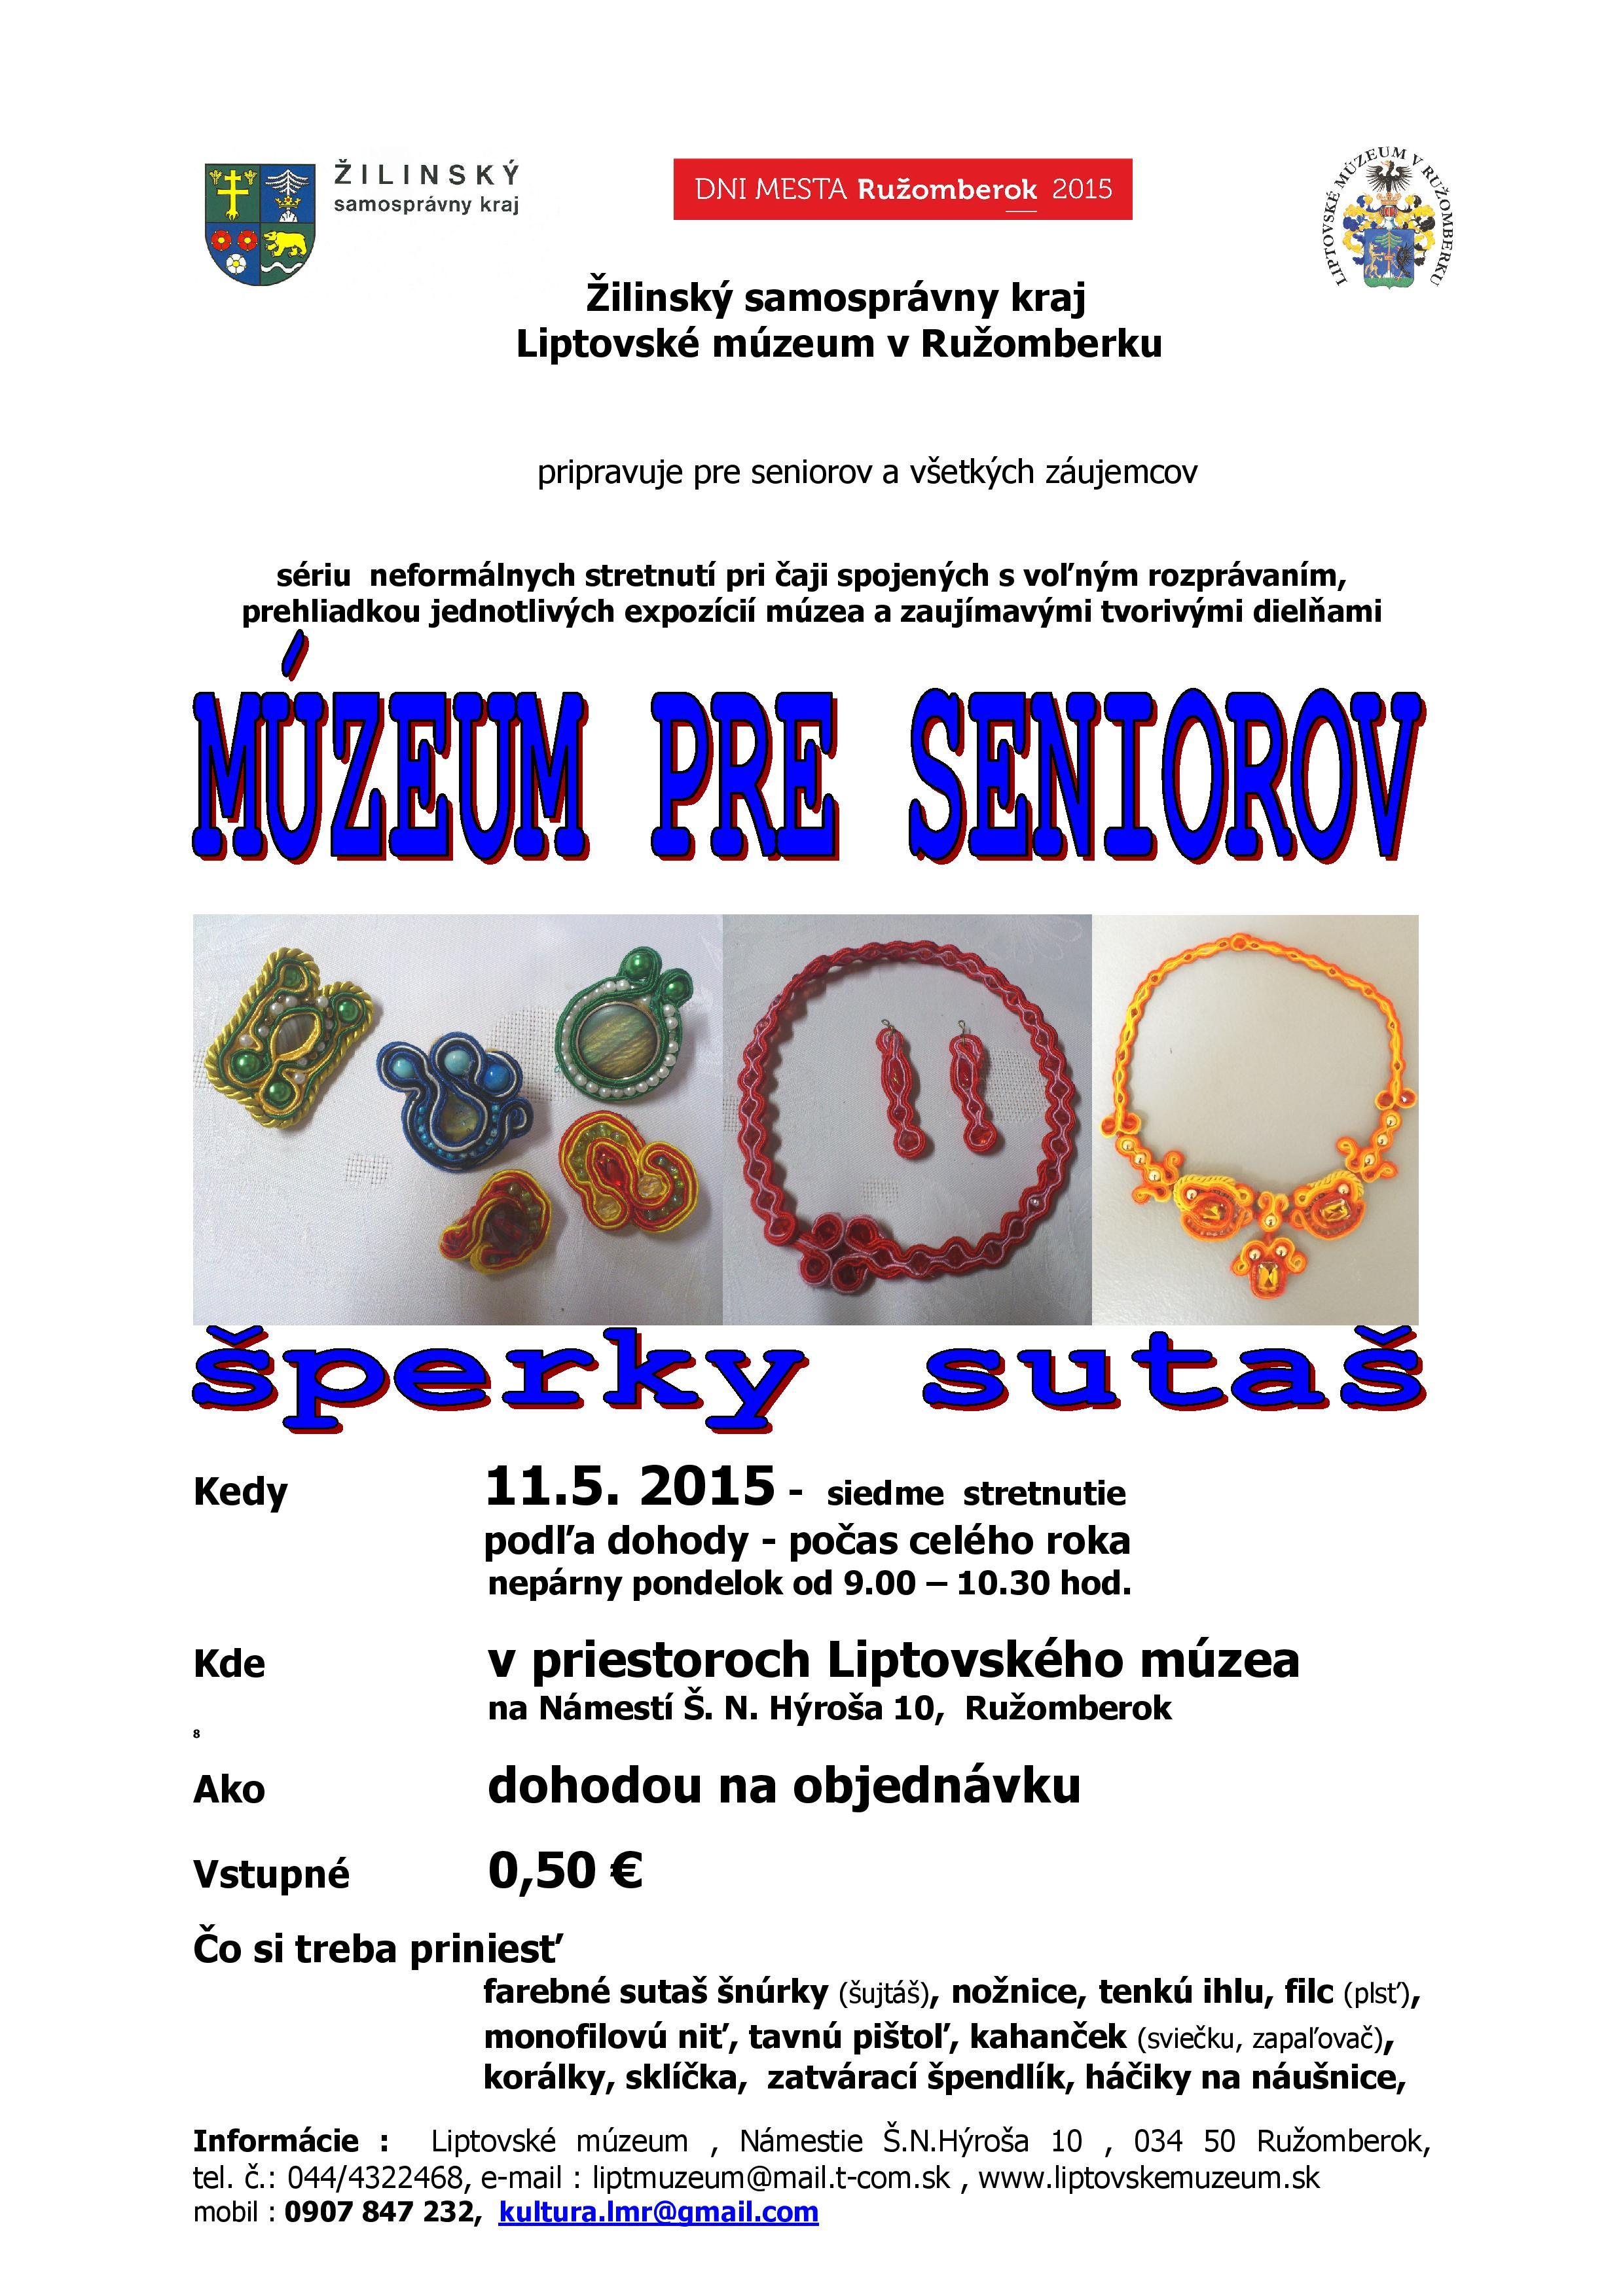 mps-sperky-sutas-maj-2015-plagat